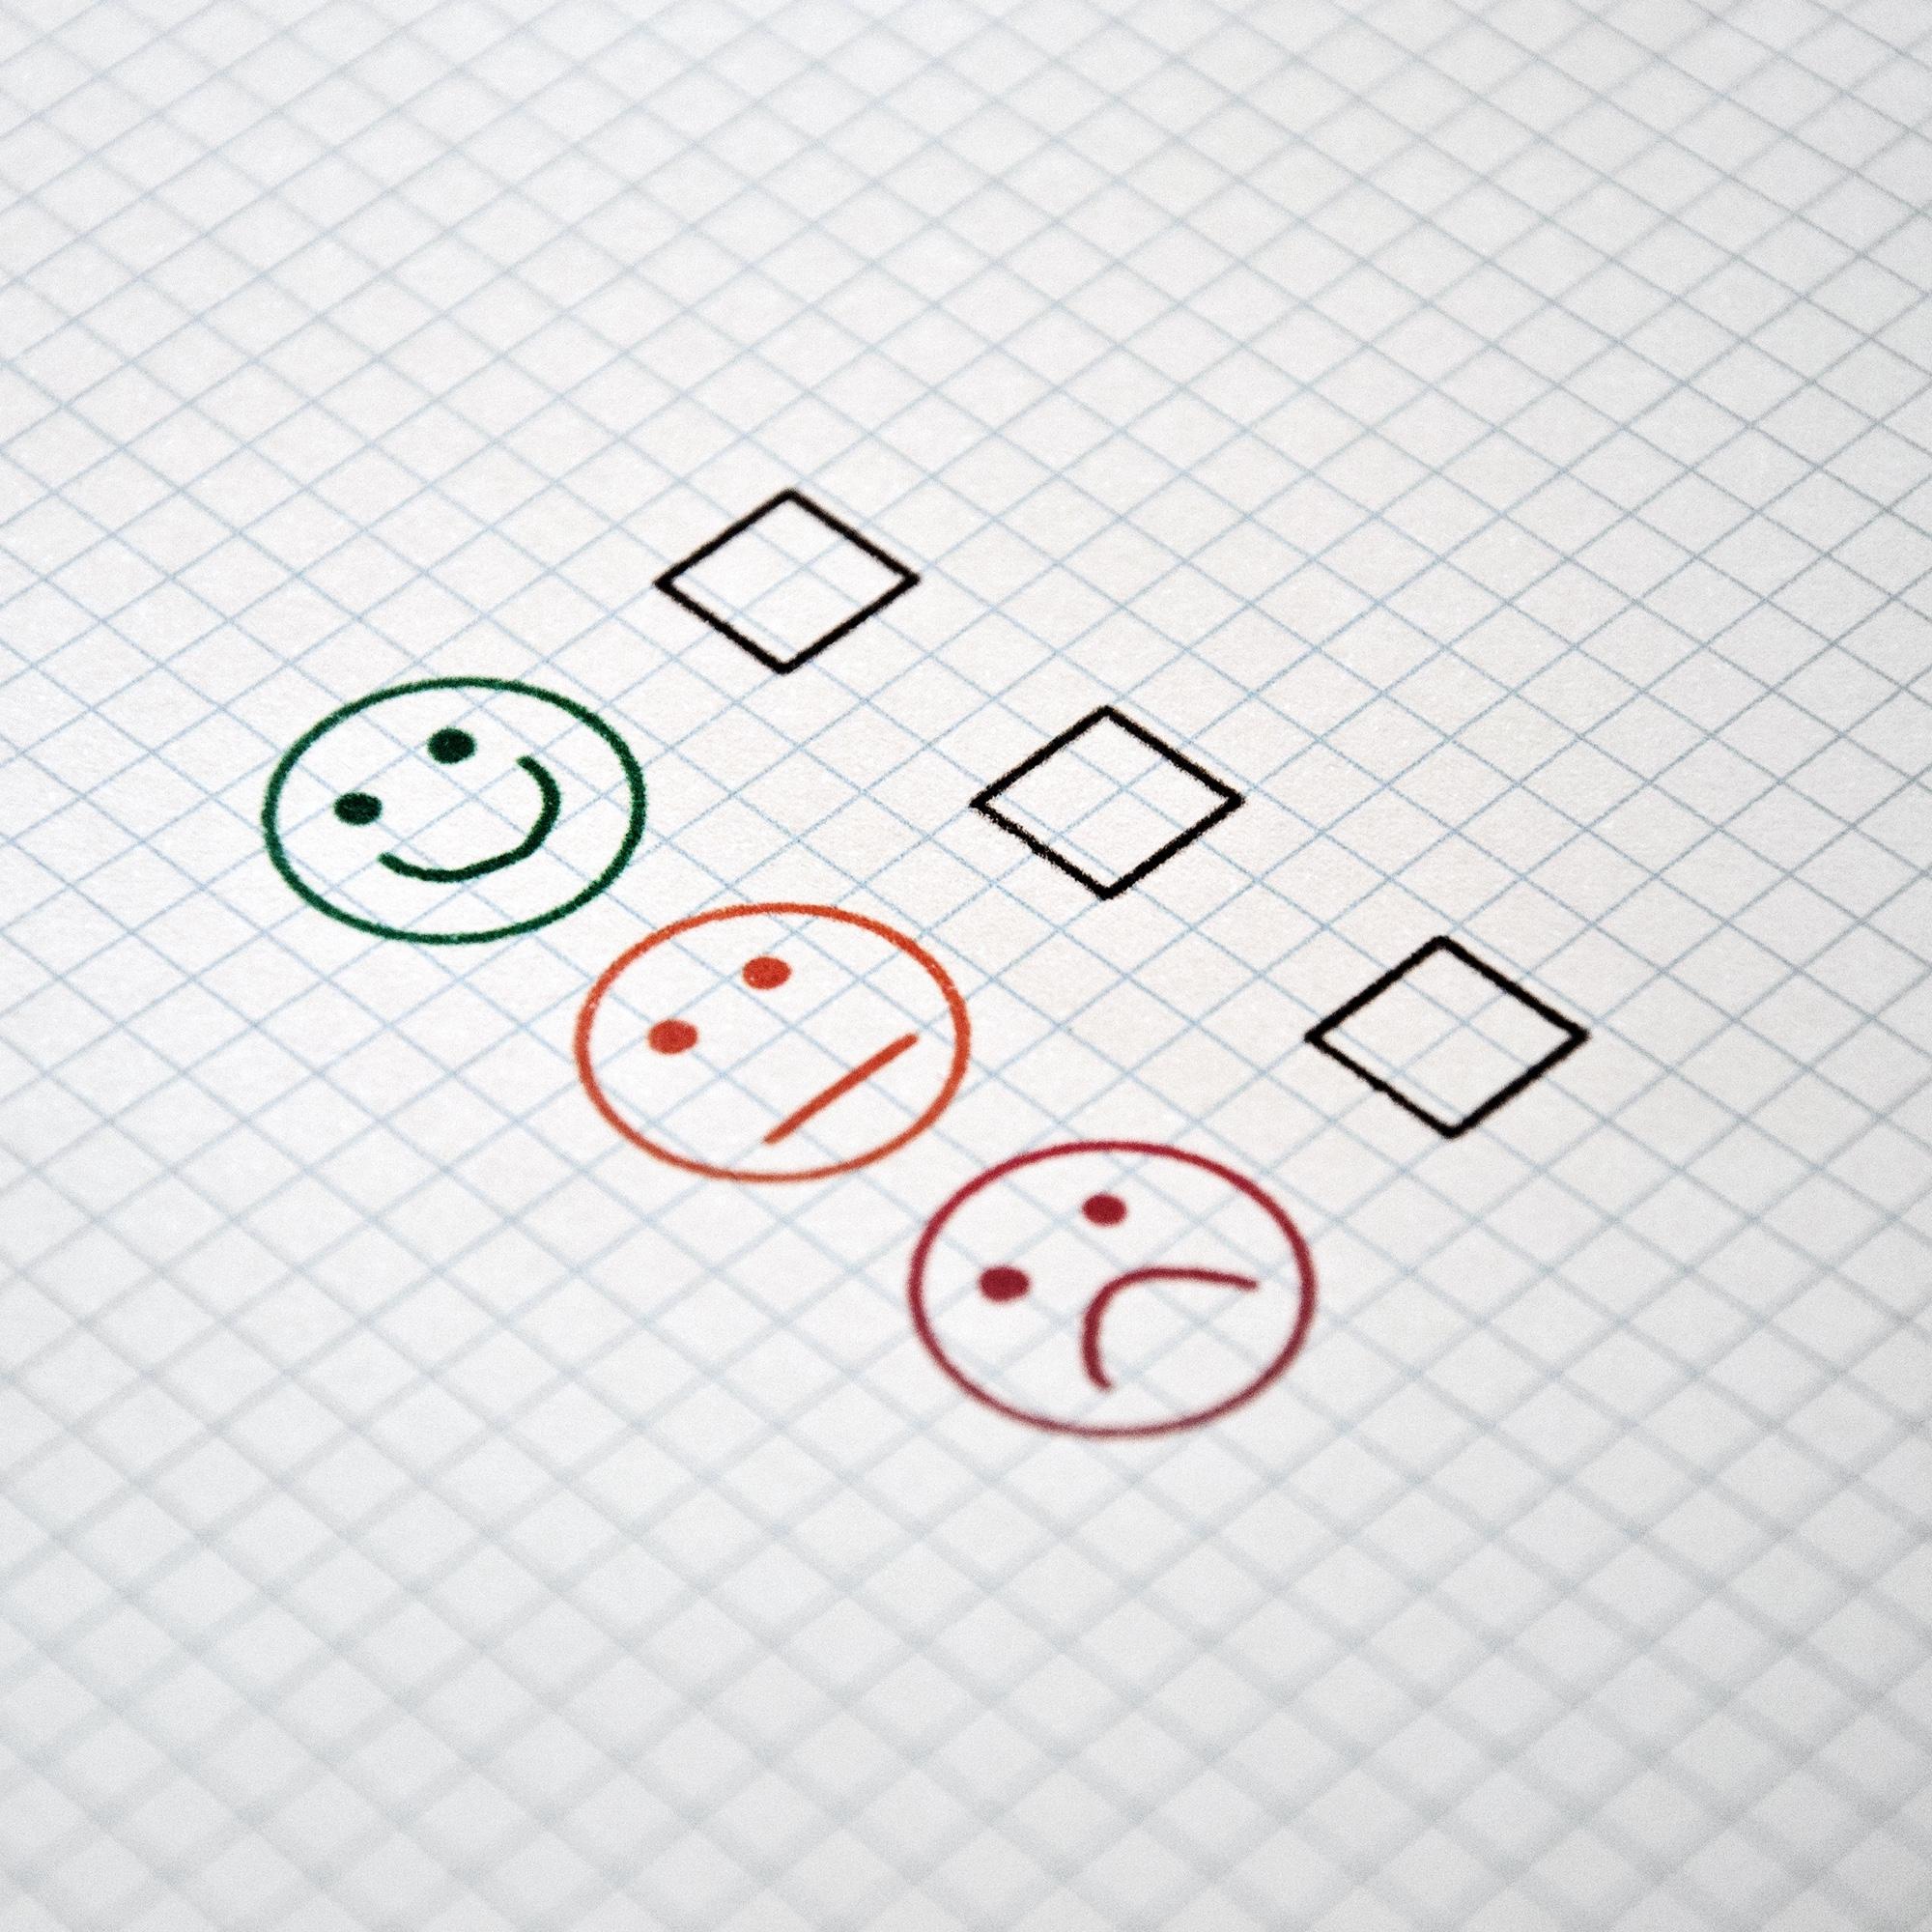 Foto: Checkliste mit Smileys